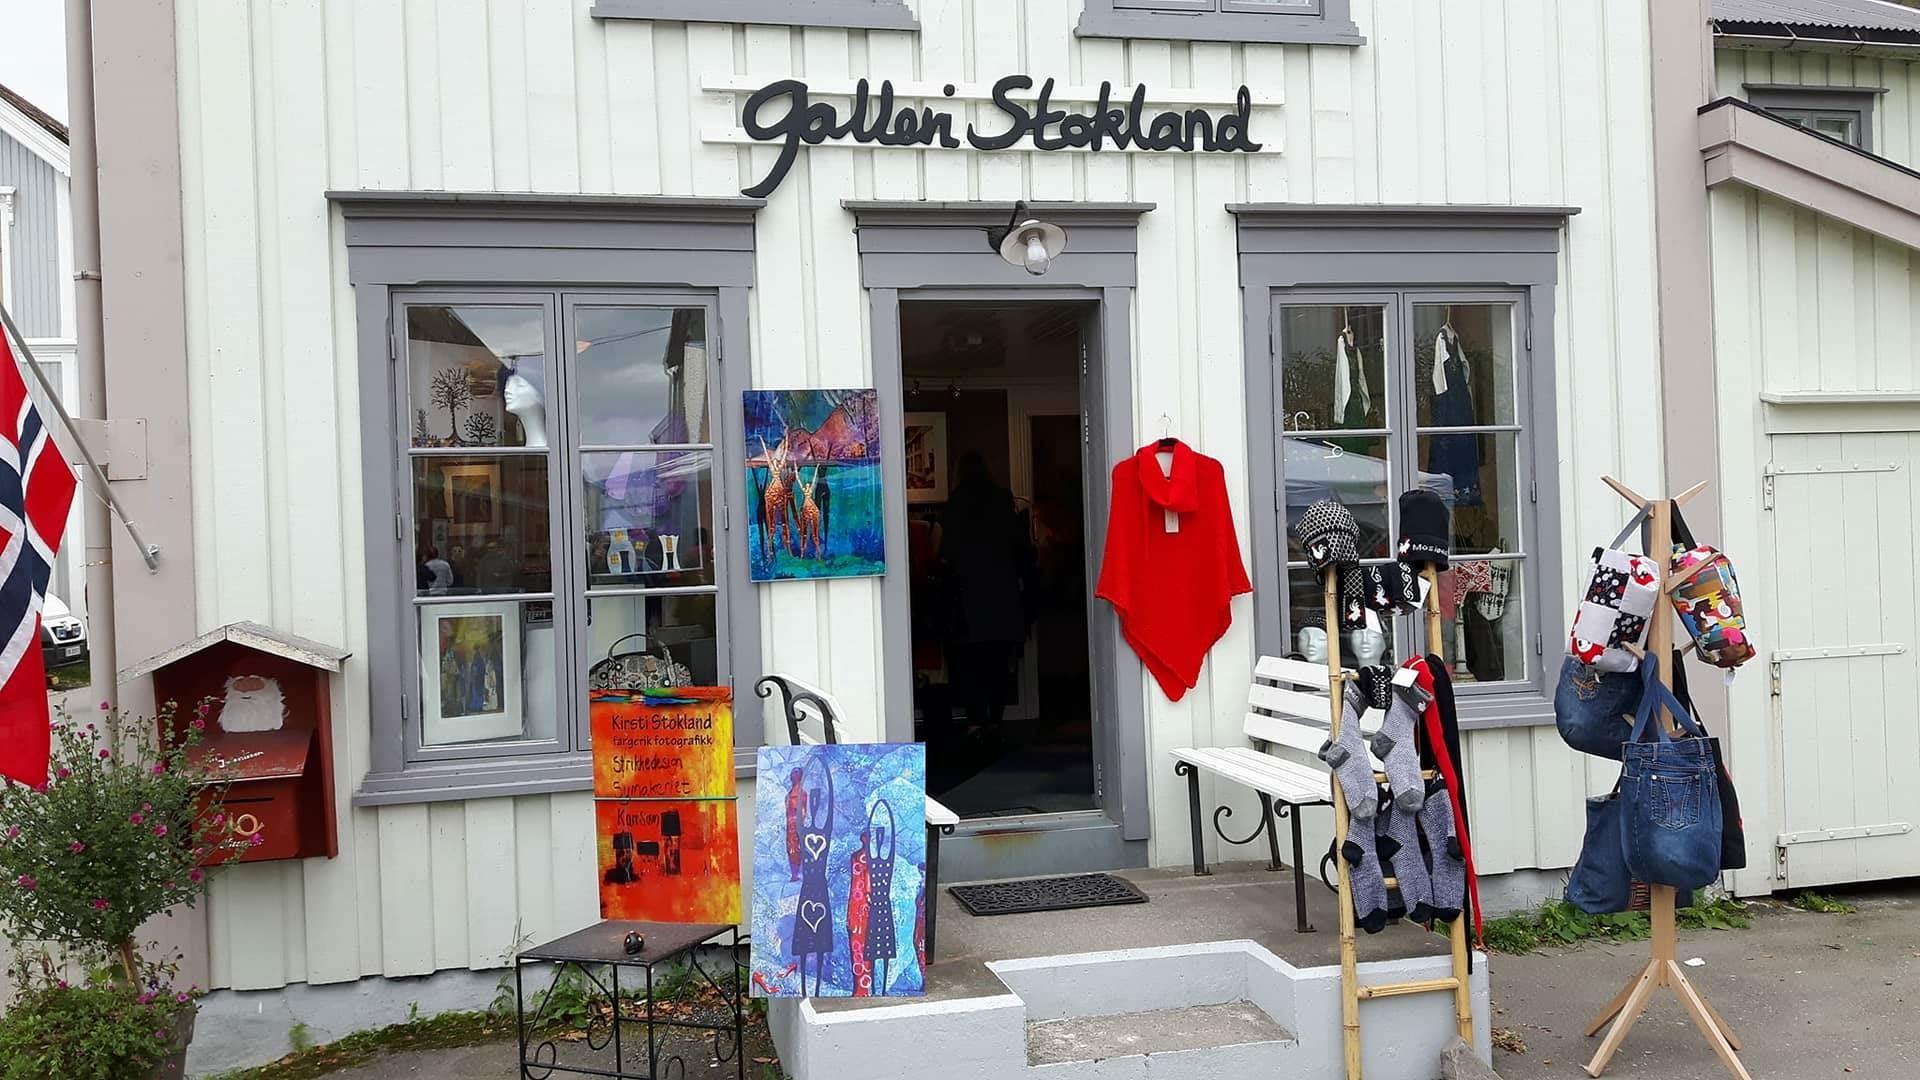 Galleri Stokland,  © Galleri Stokland, Galleri Stokland i Mosjøen